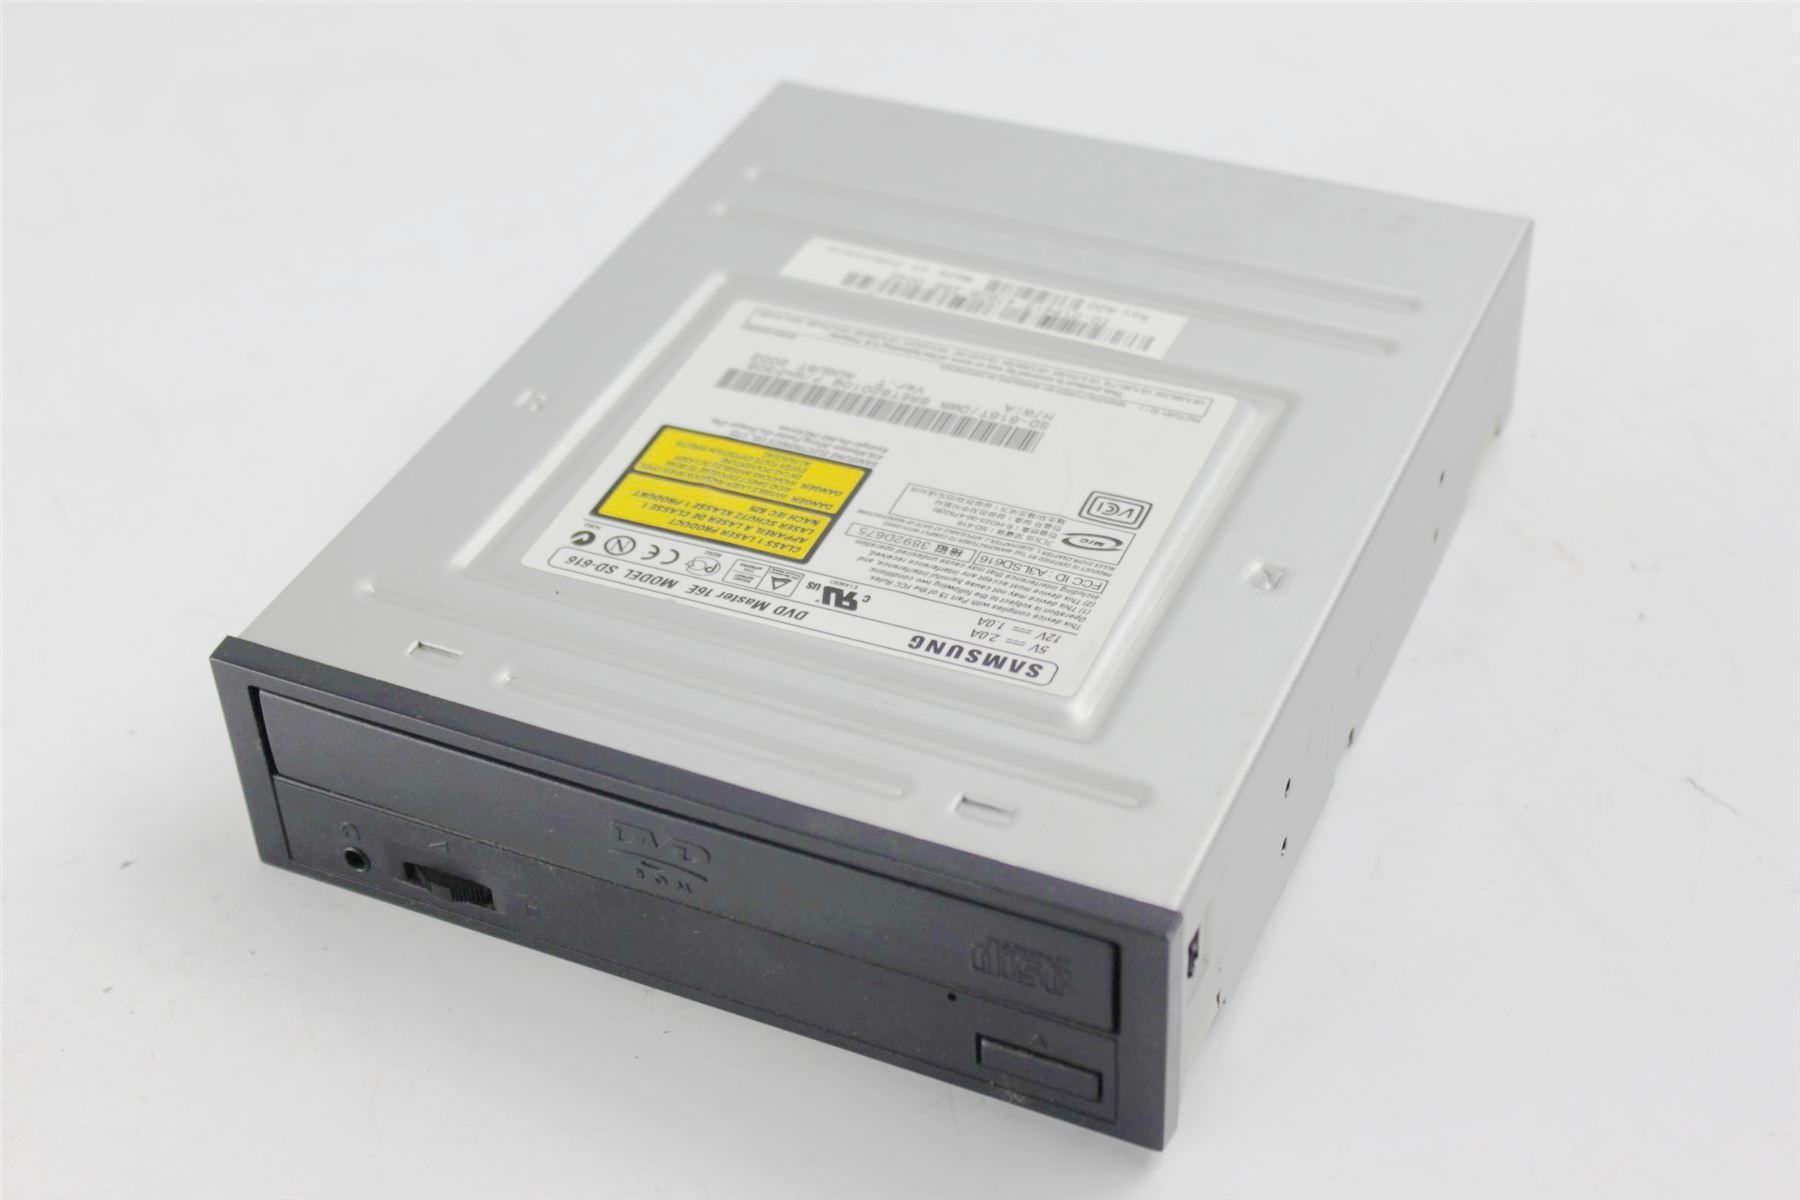 Cd Dvd Rom Driver For Microsoft Windows 7 - …